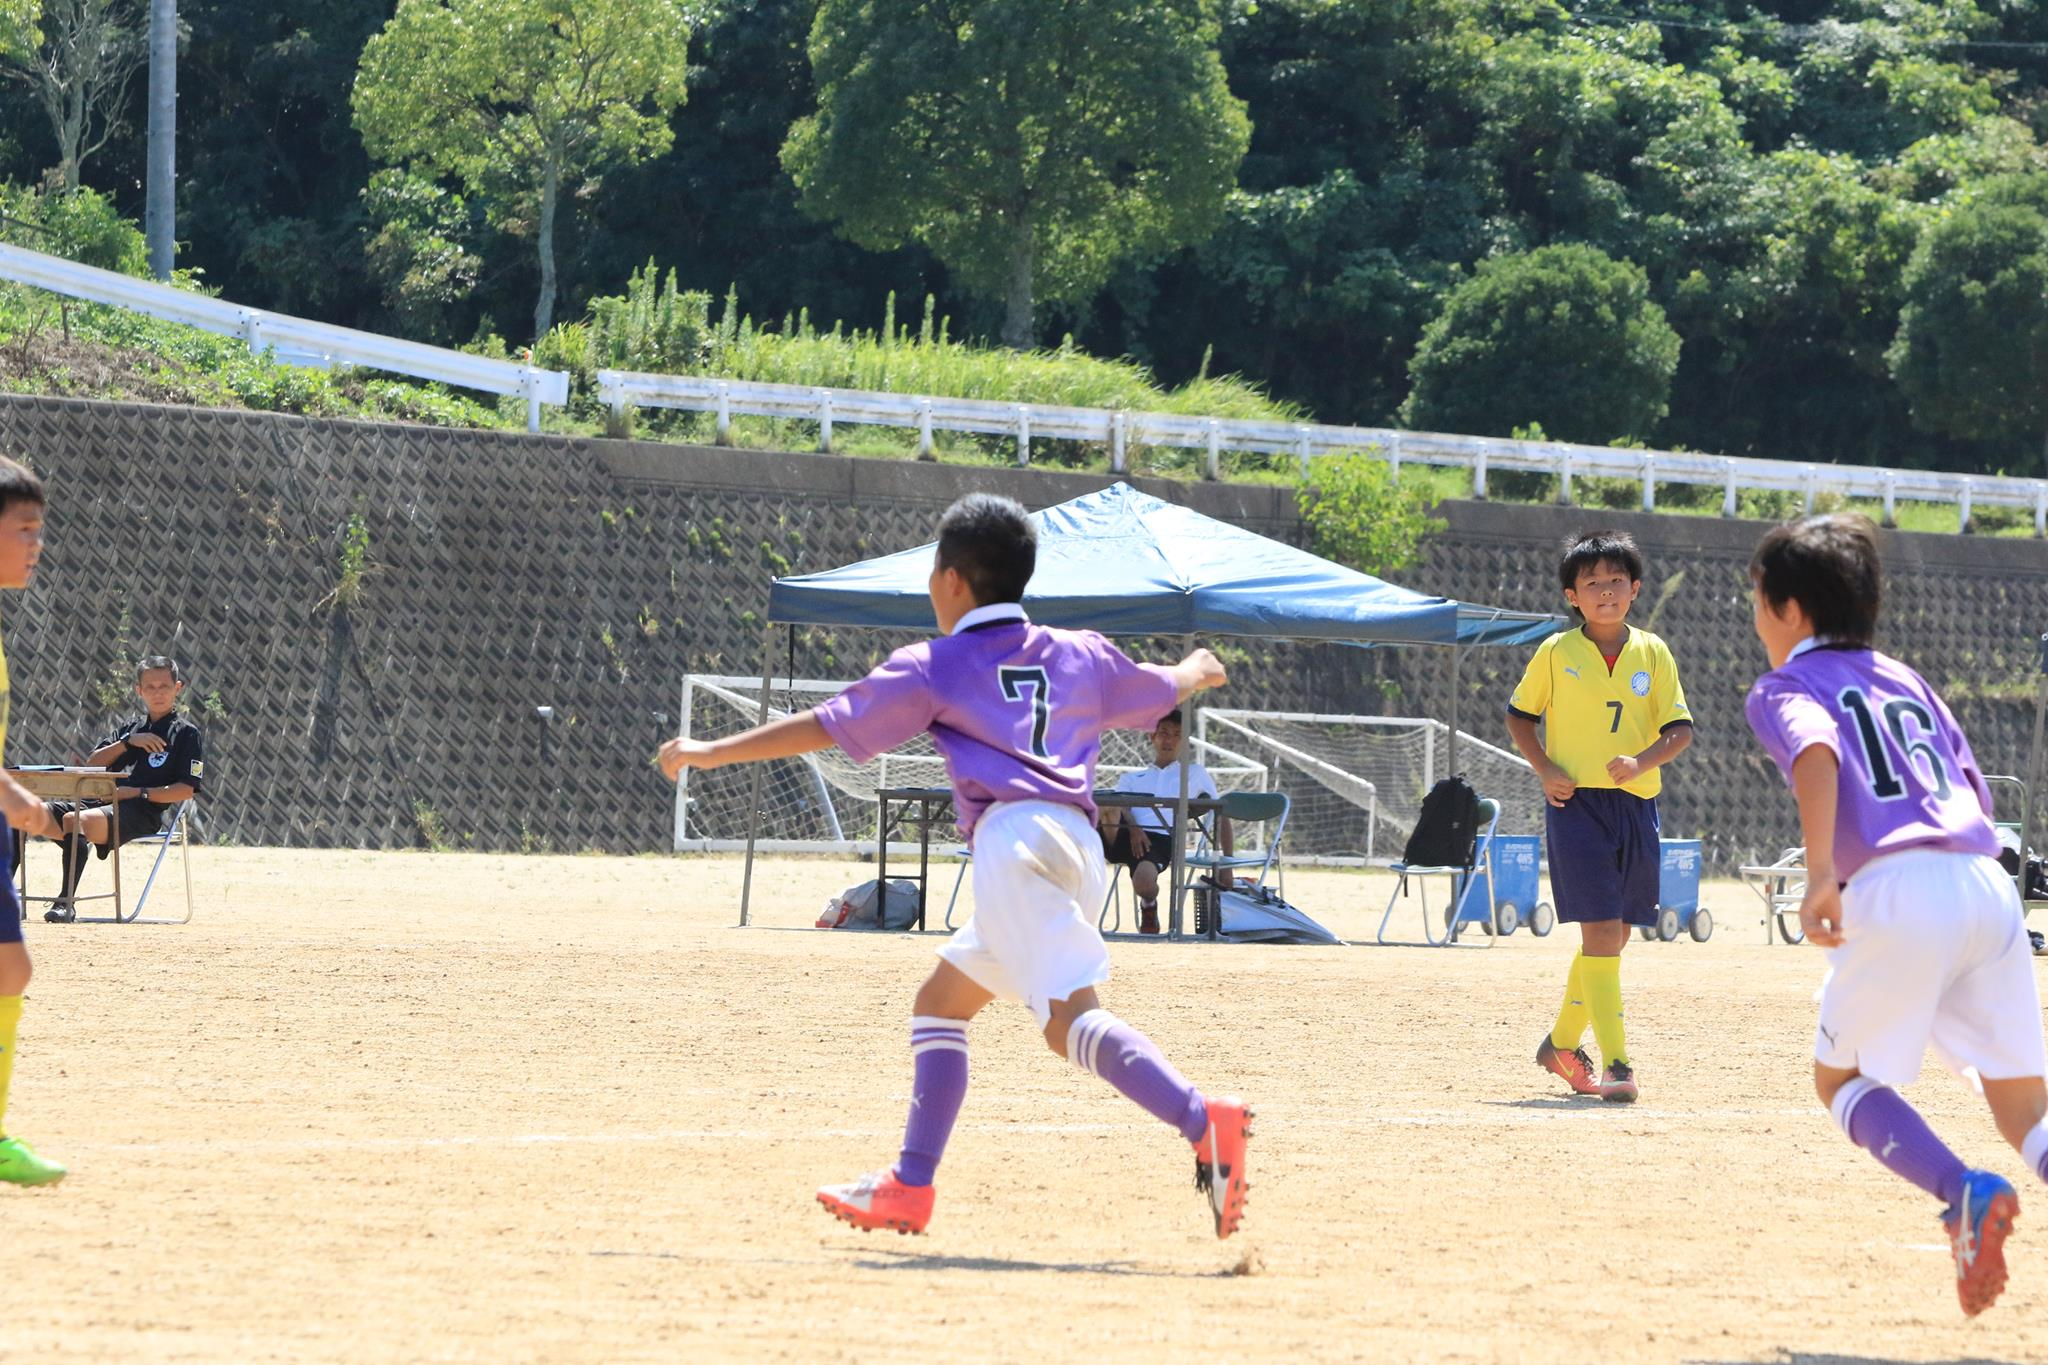 2016U10しんきんカップ中西部予選vs島田第一ゴールシーン05.jpg